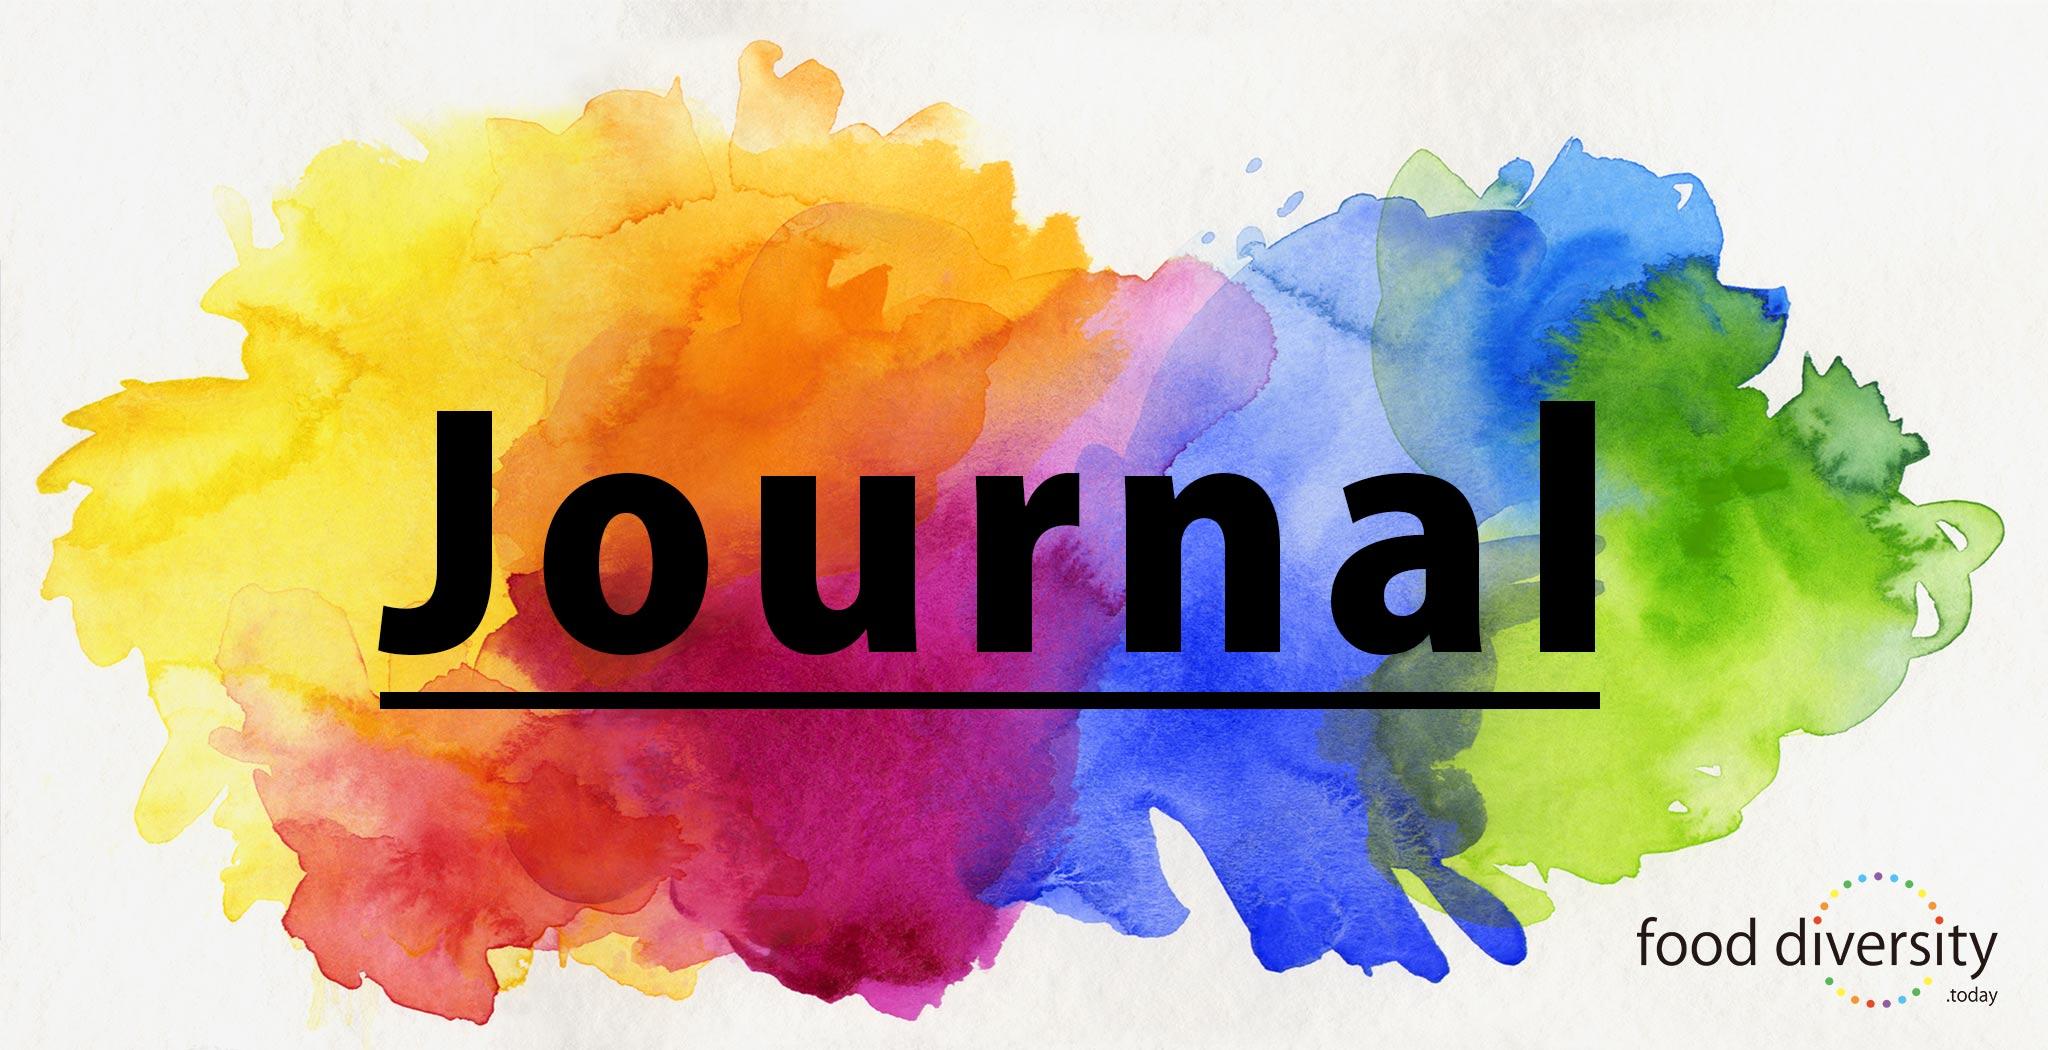 food diversity.today Journal